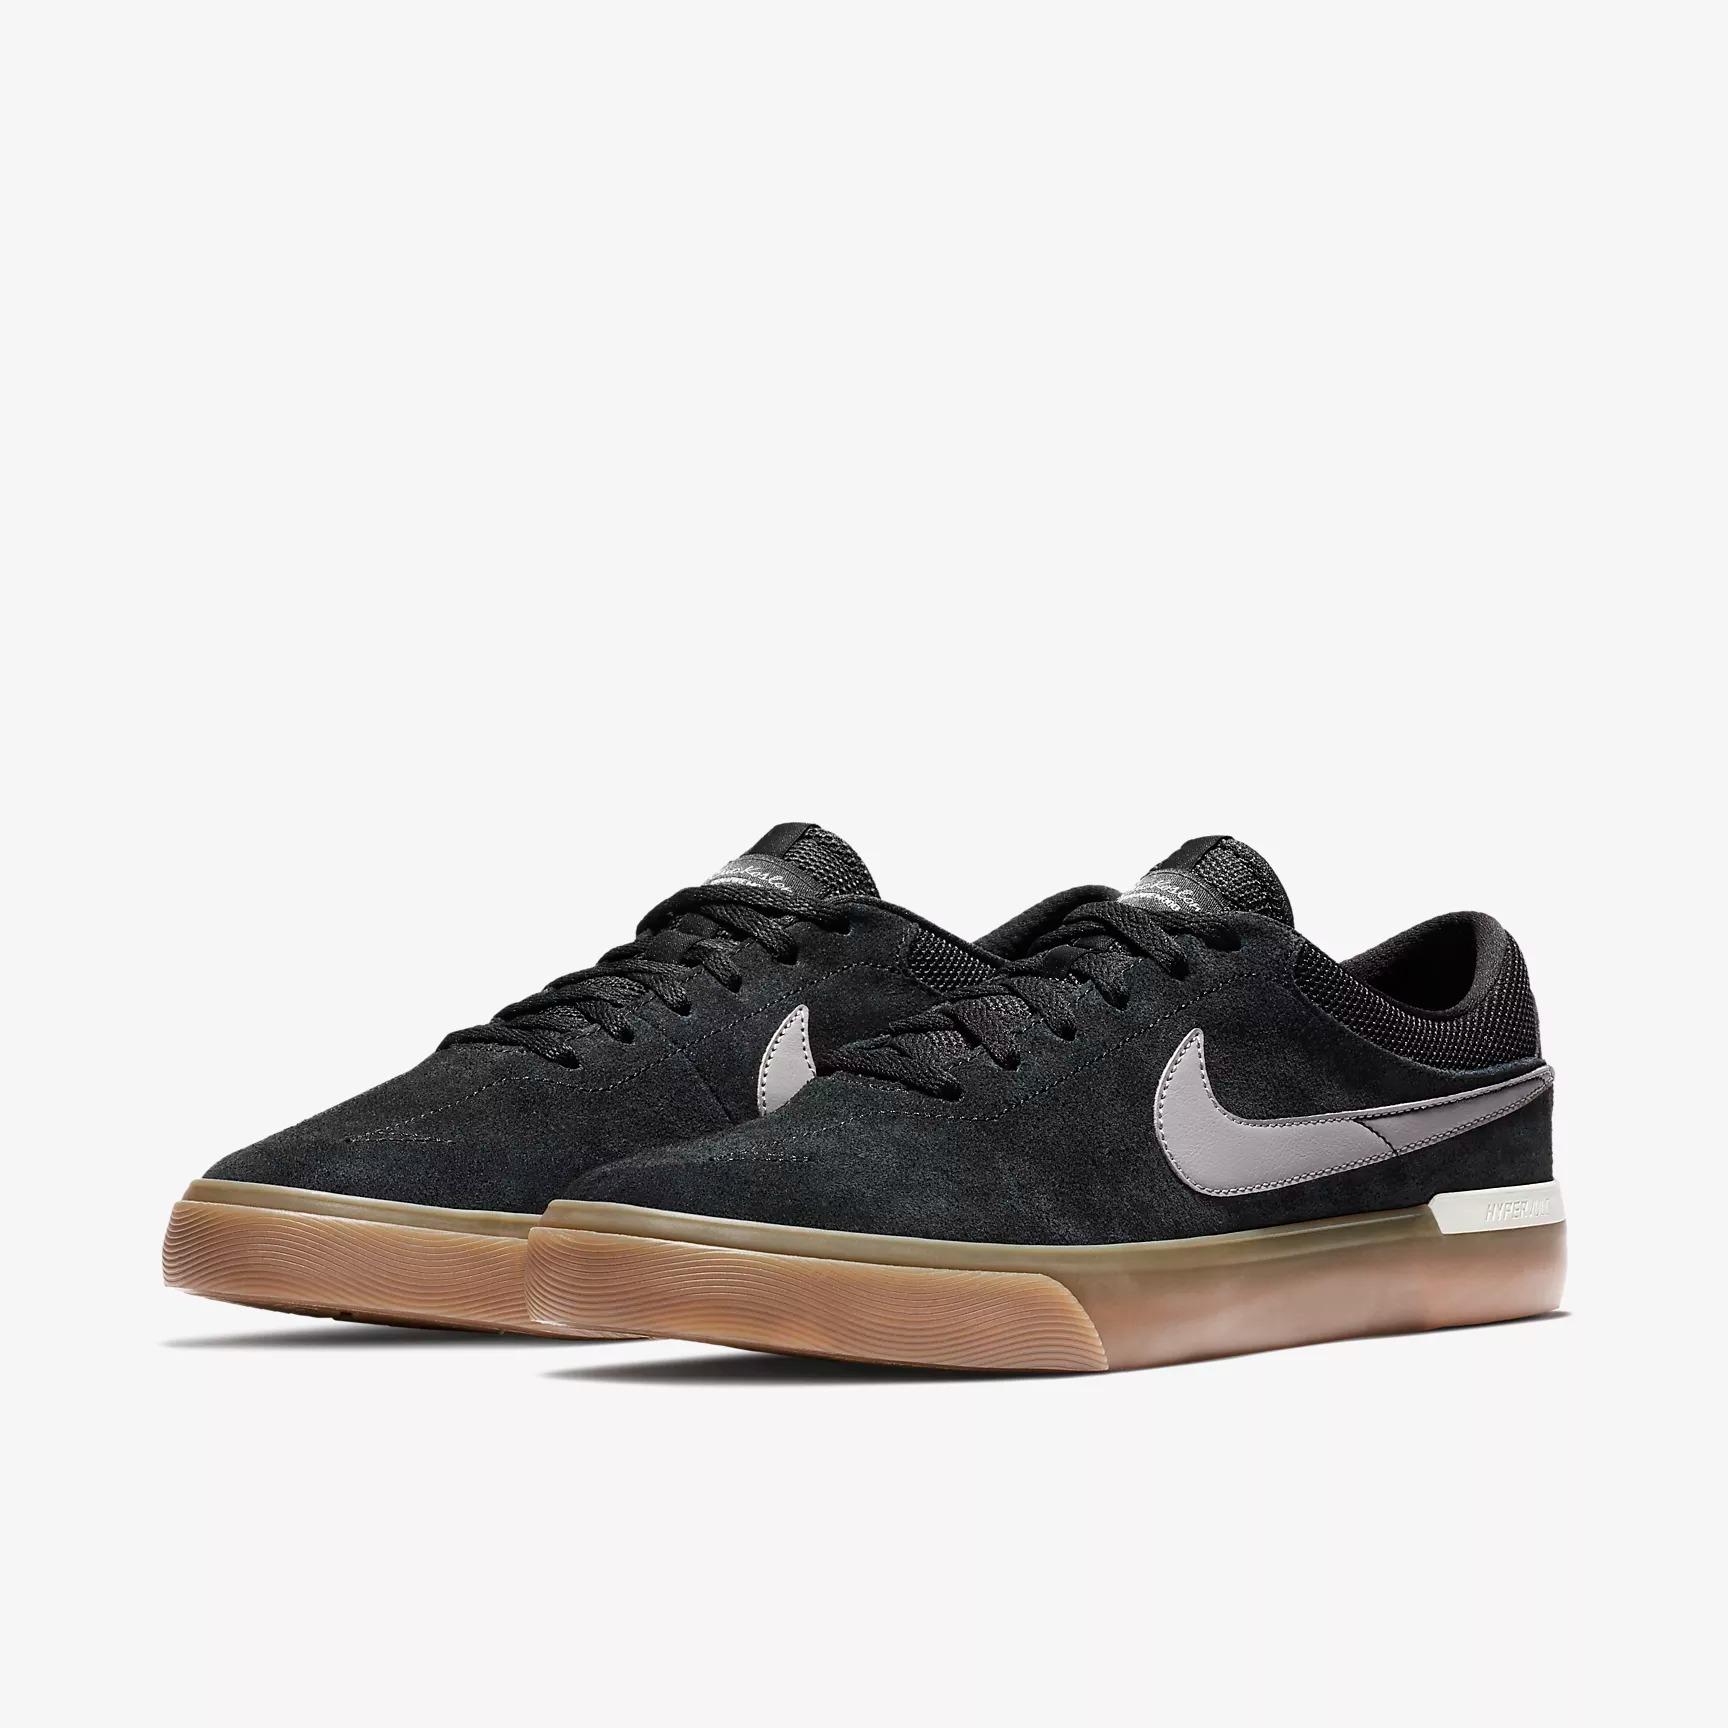 a57673dceb0f Nike SB Koston Hypervulc Sneakers - SPORT SHOES Lifestyle Shoes ...